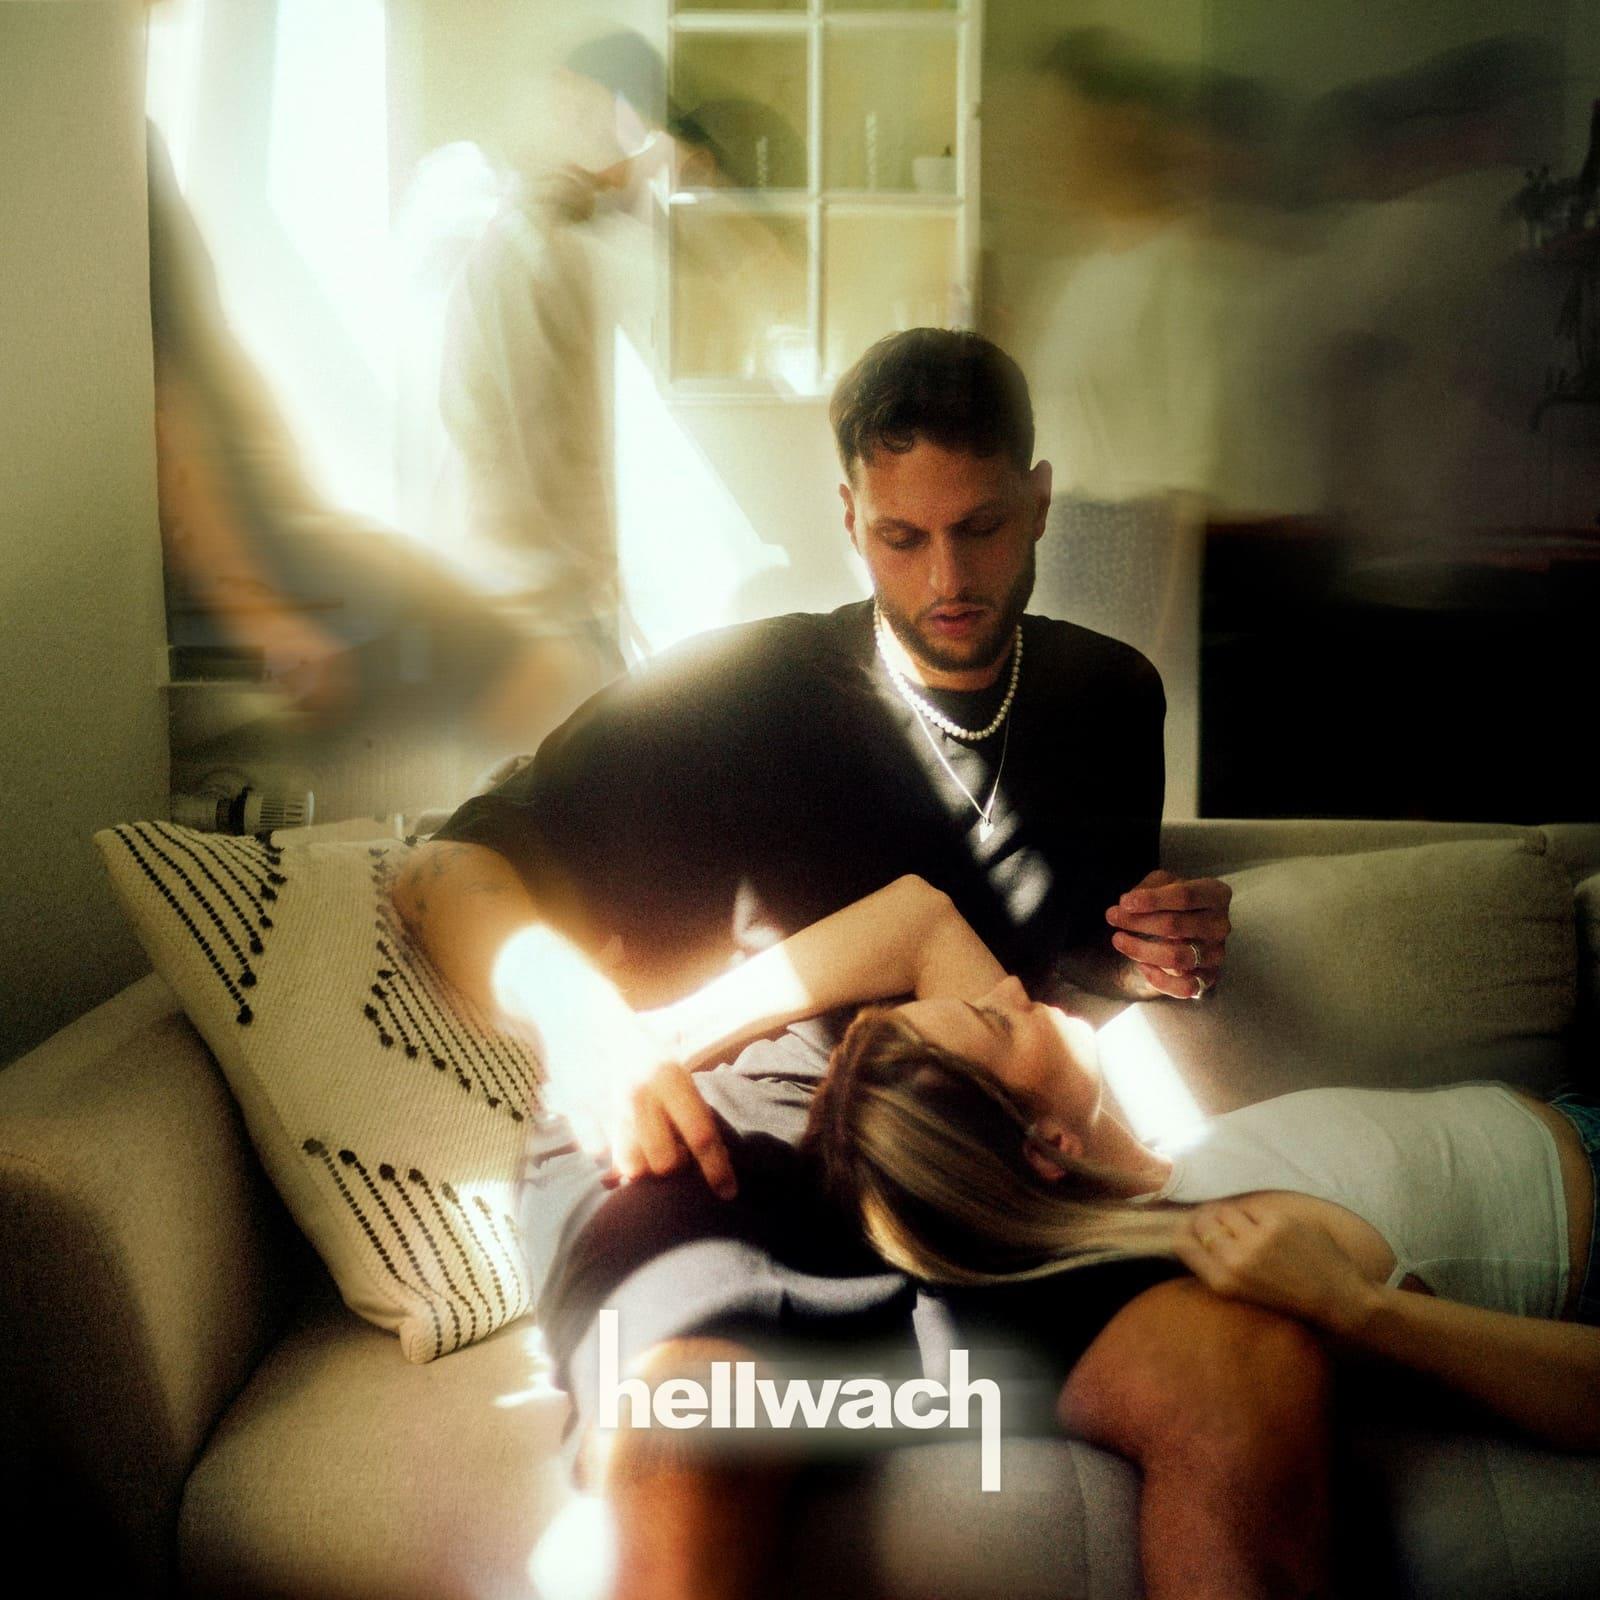 Upcoming: kilian wasi - Hellwach